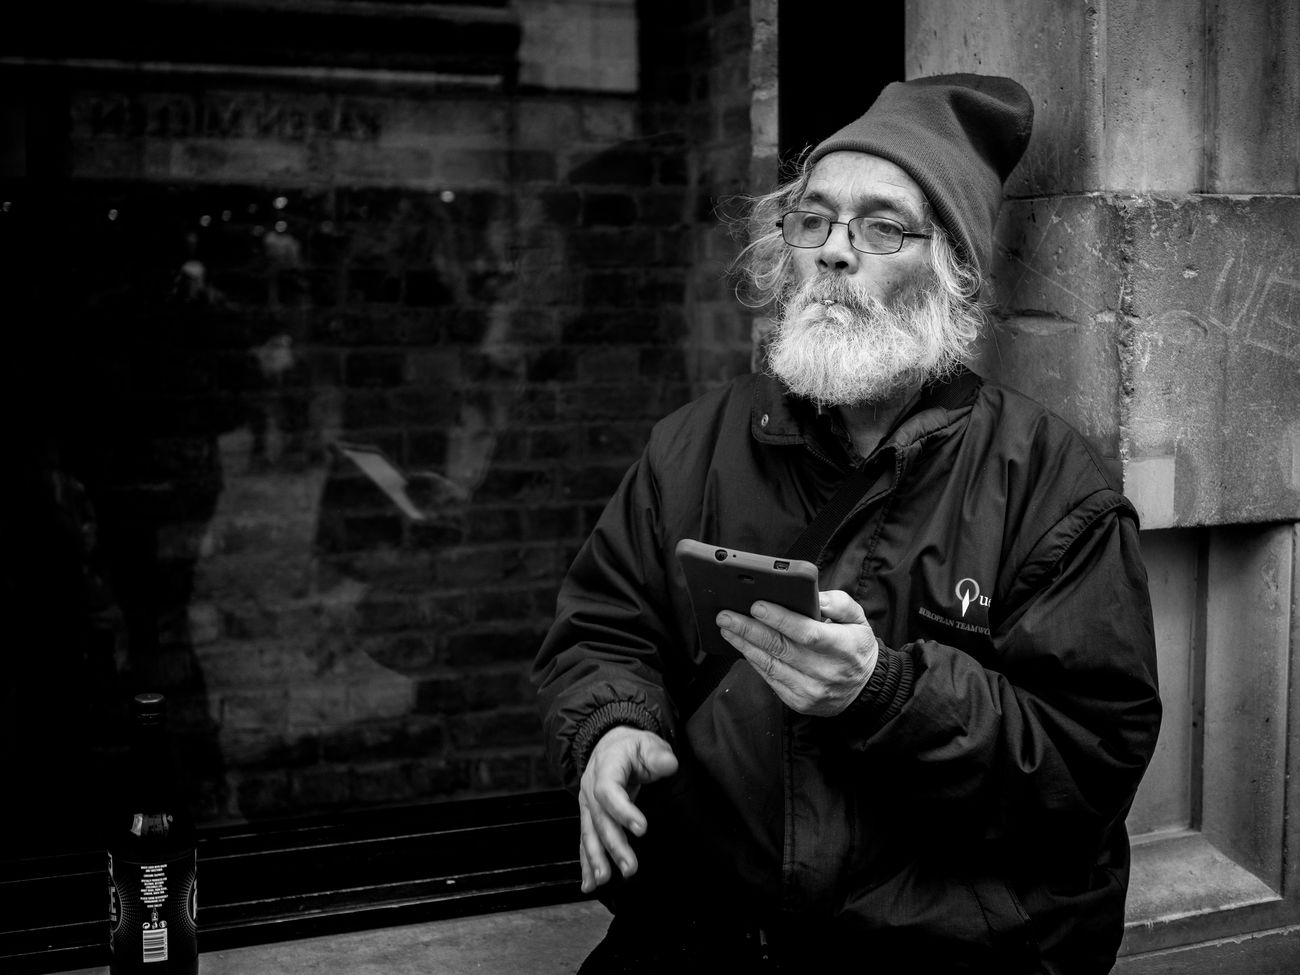 There Pleasures. Monochrome Photography Prime Lens London Street Photography Peope Streetphotography Street Maxgor.com Maxgor Rawstreets Olympus Pen-f 50mm Olympuspenef City Portrait City Life Blackandwhite Streetphotography_bw Streetphoto_bw Black And White Soho Covent Garden Market